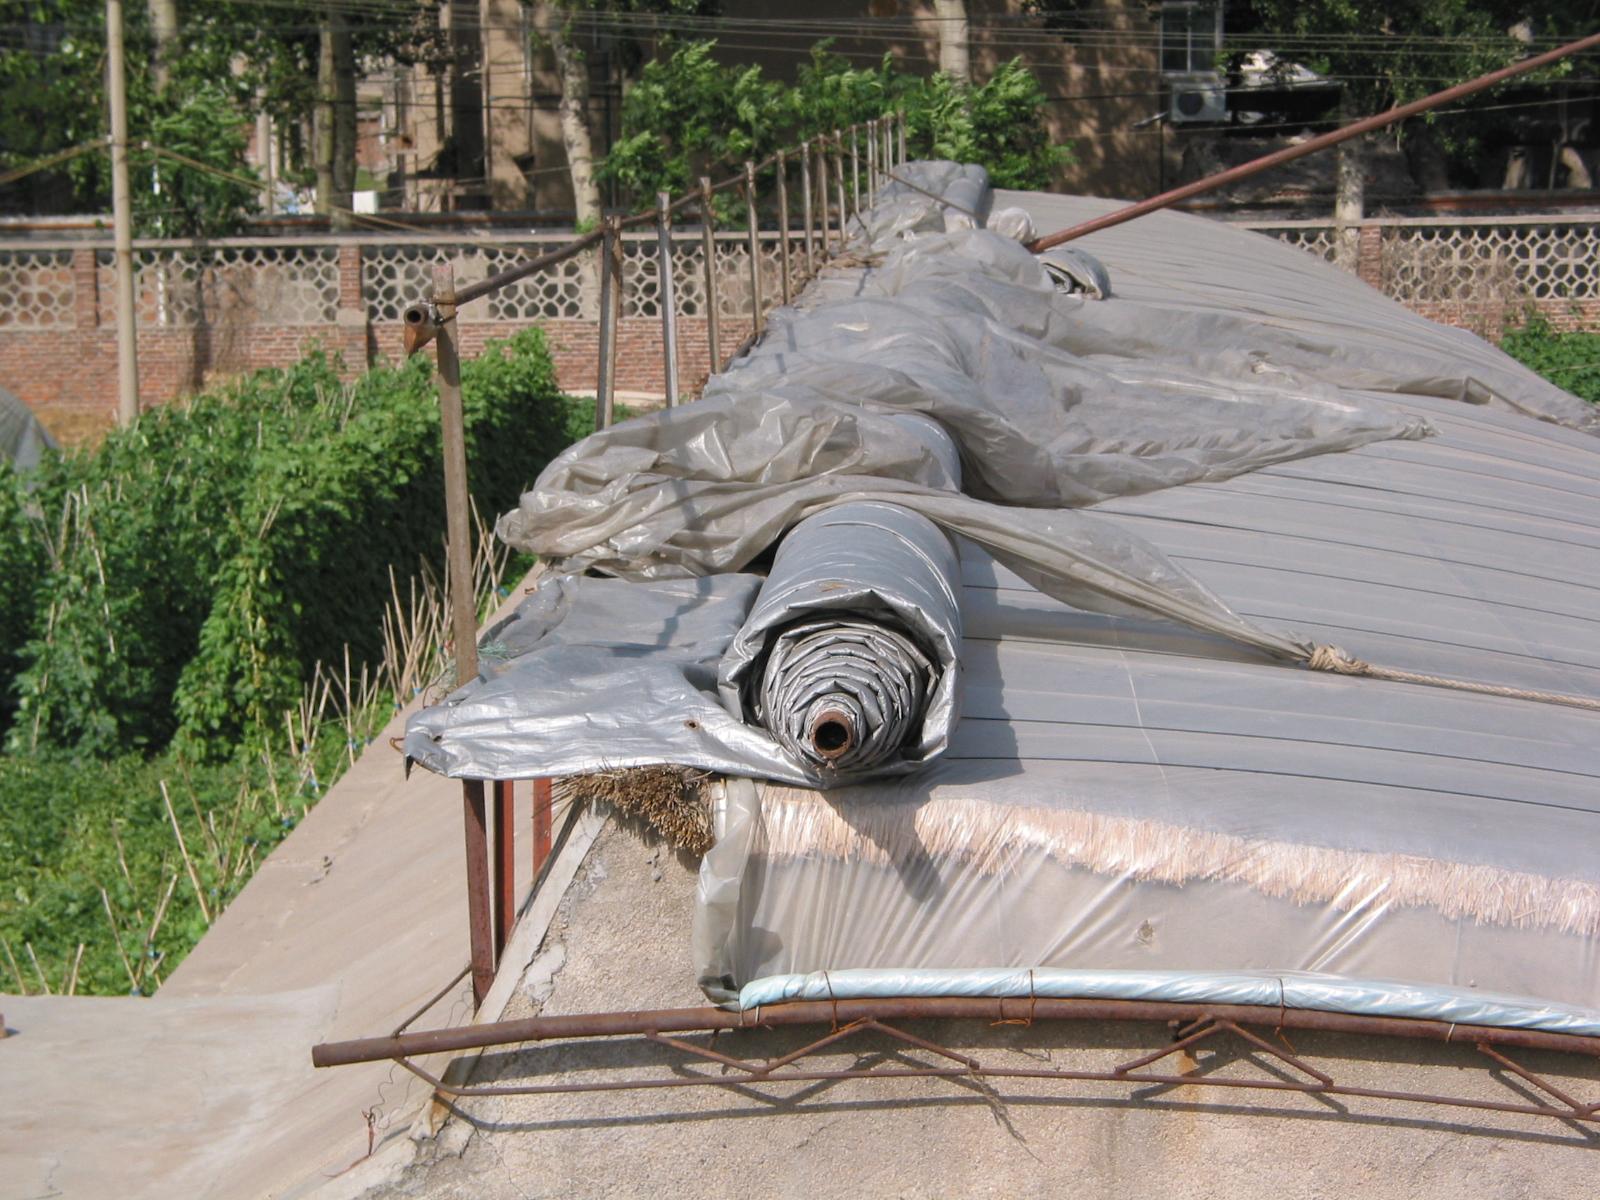 Insulating Blanket Energy Farms